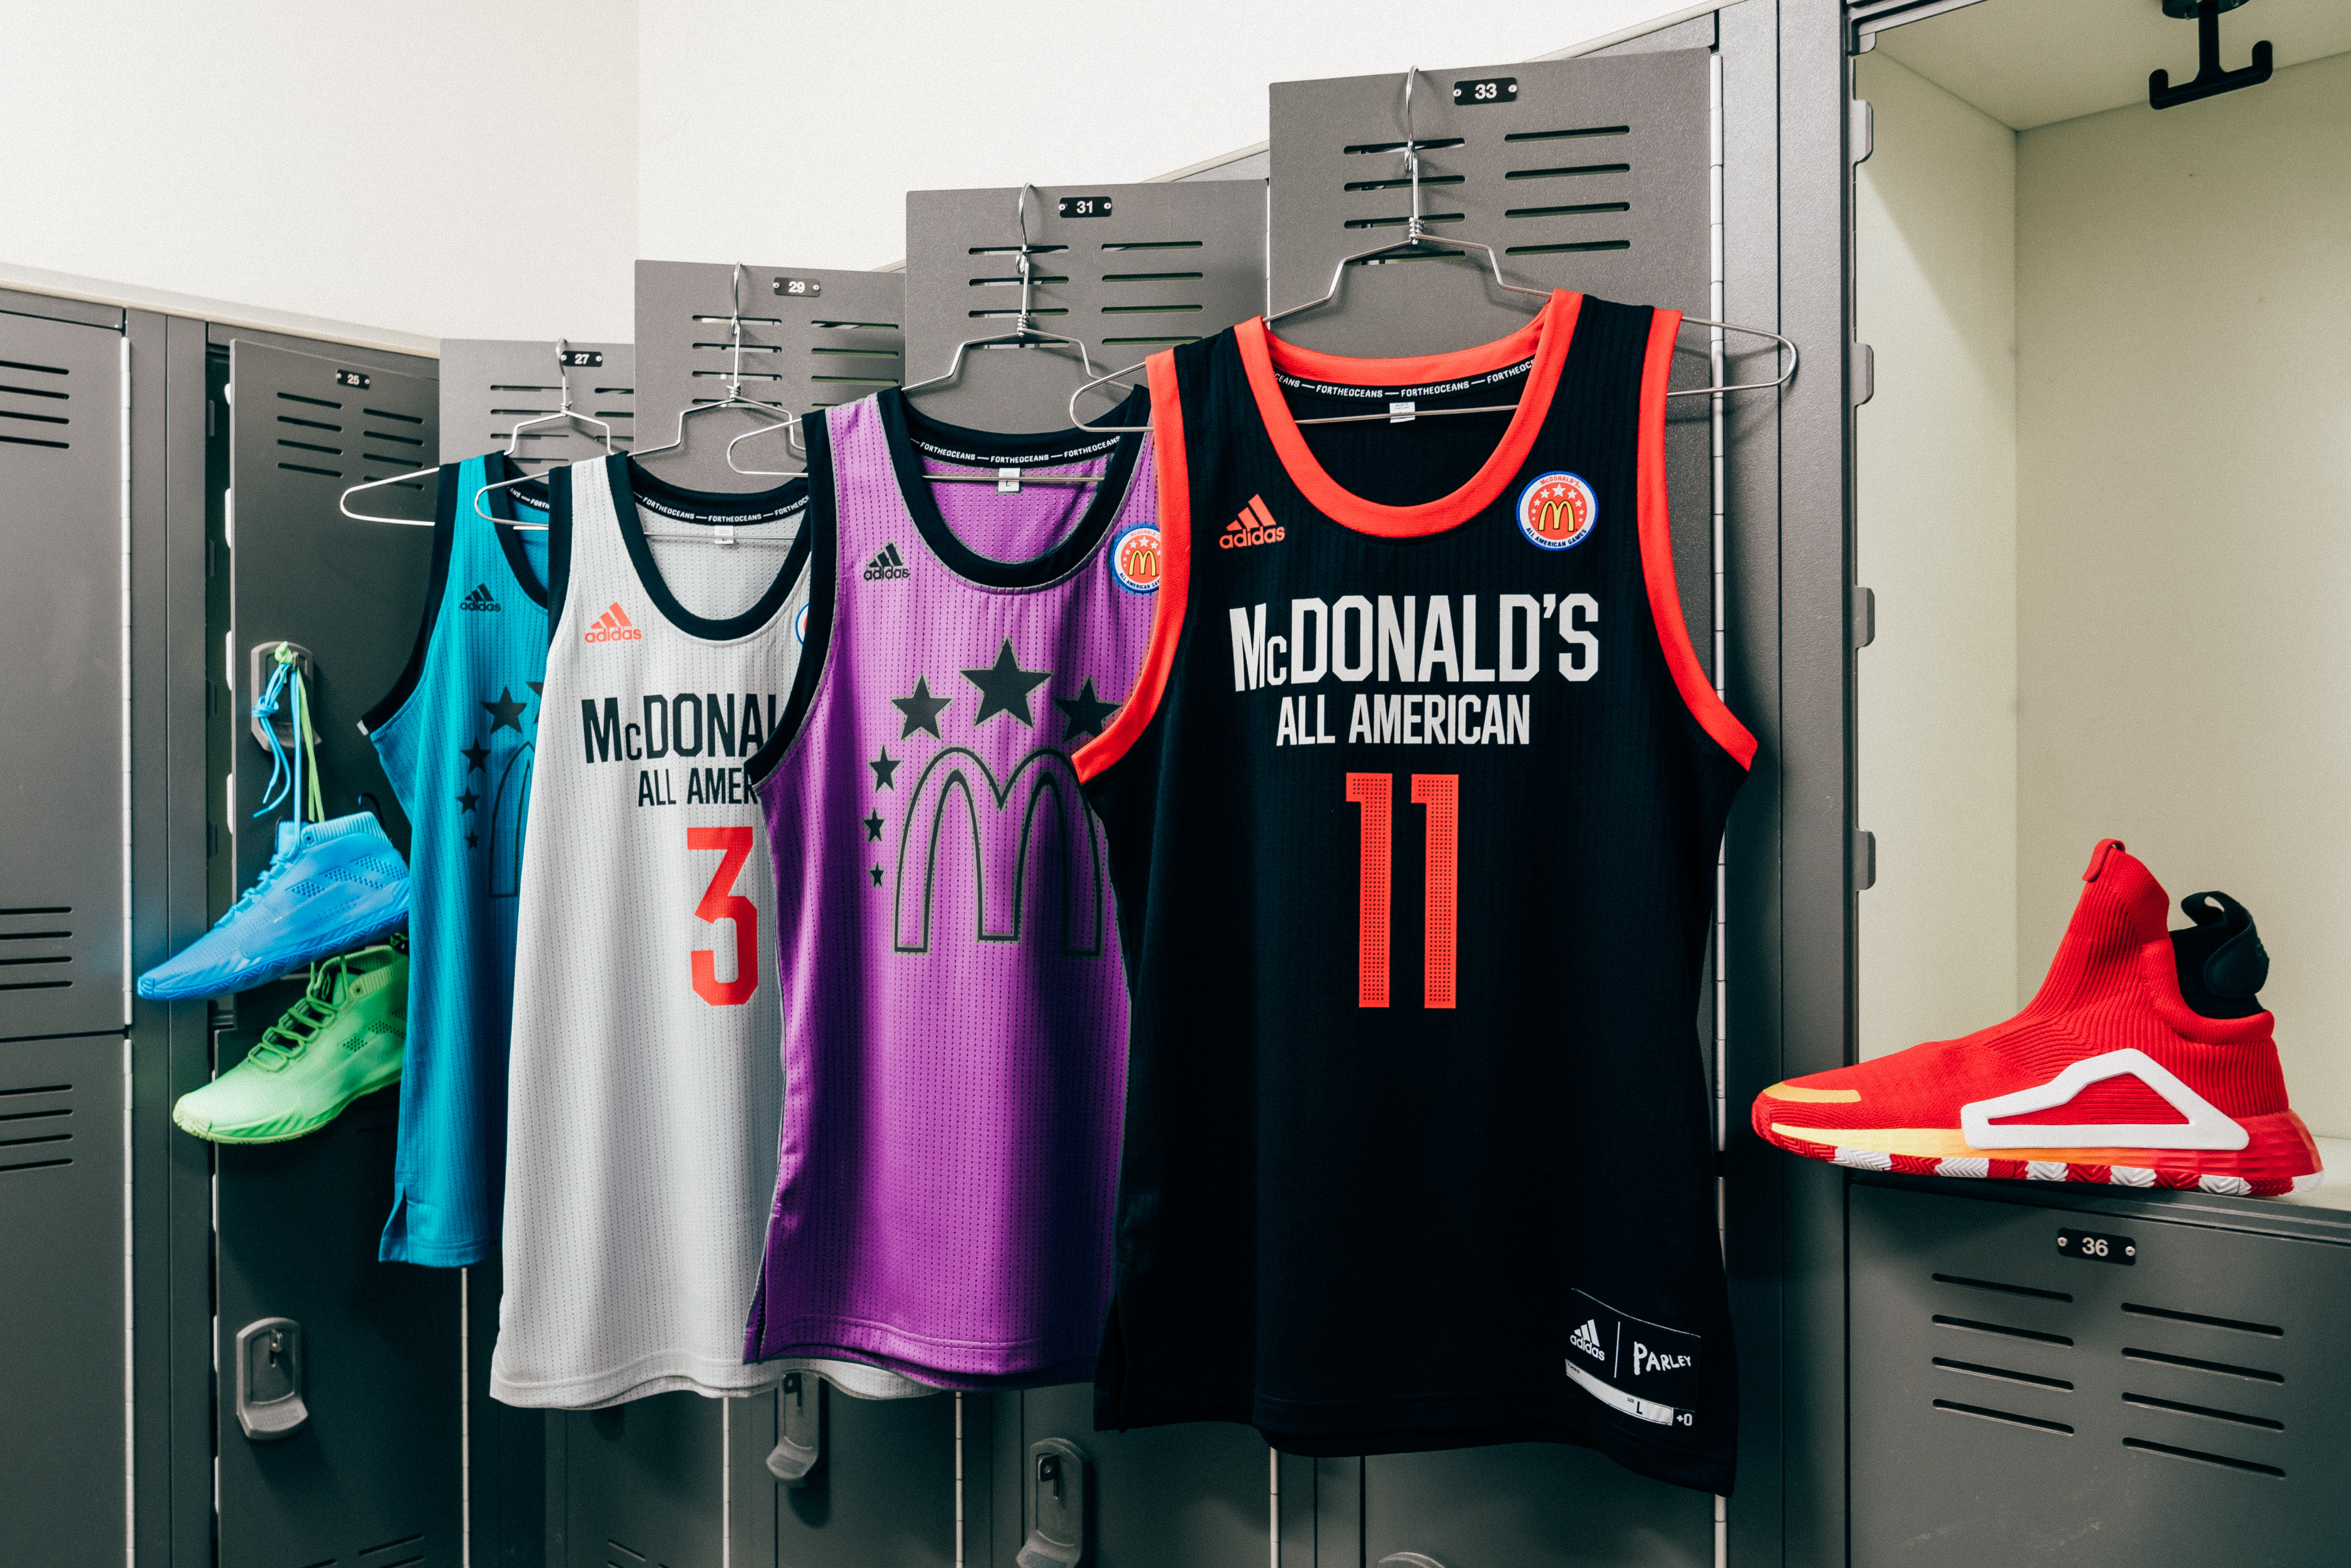 mcdonald's all american jersey 2019